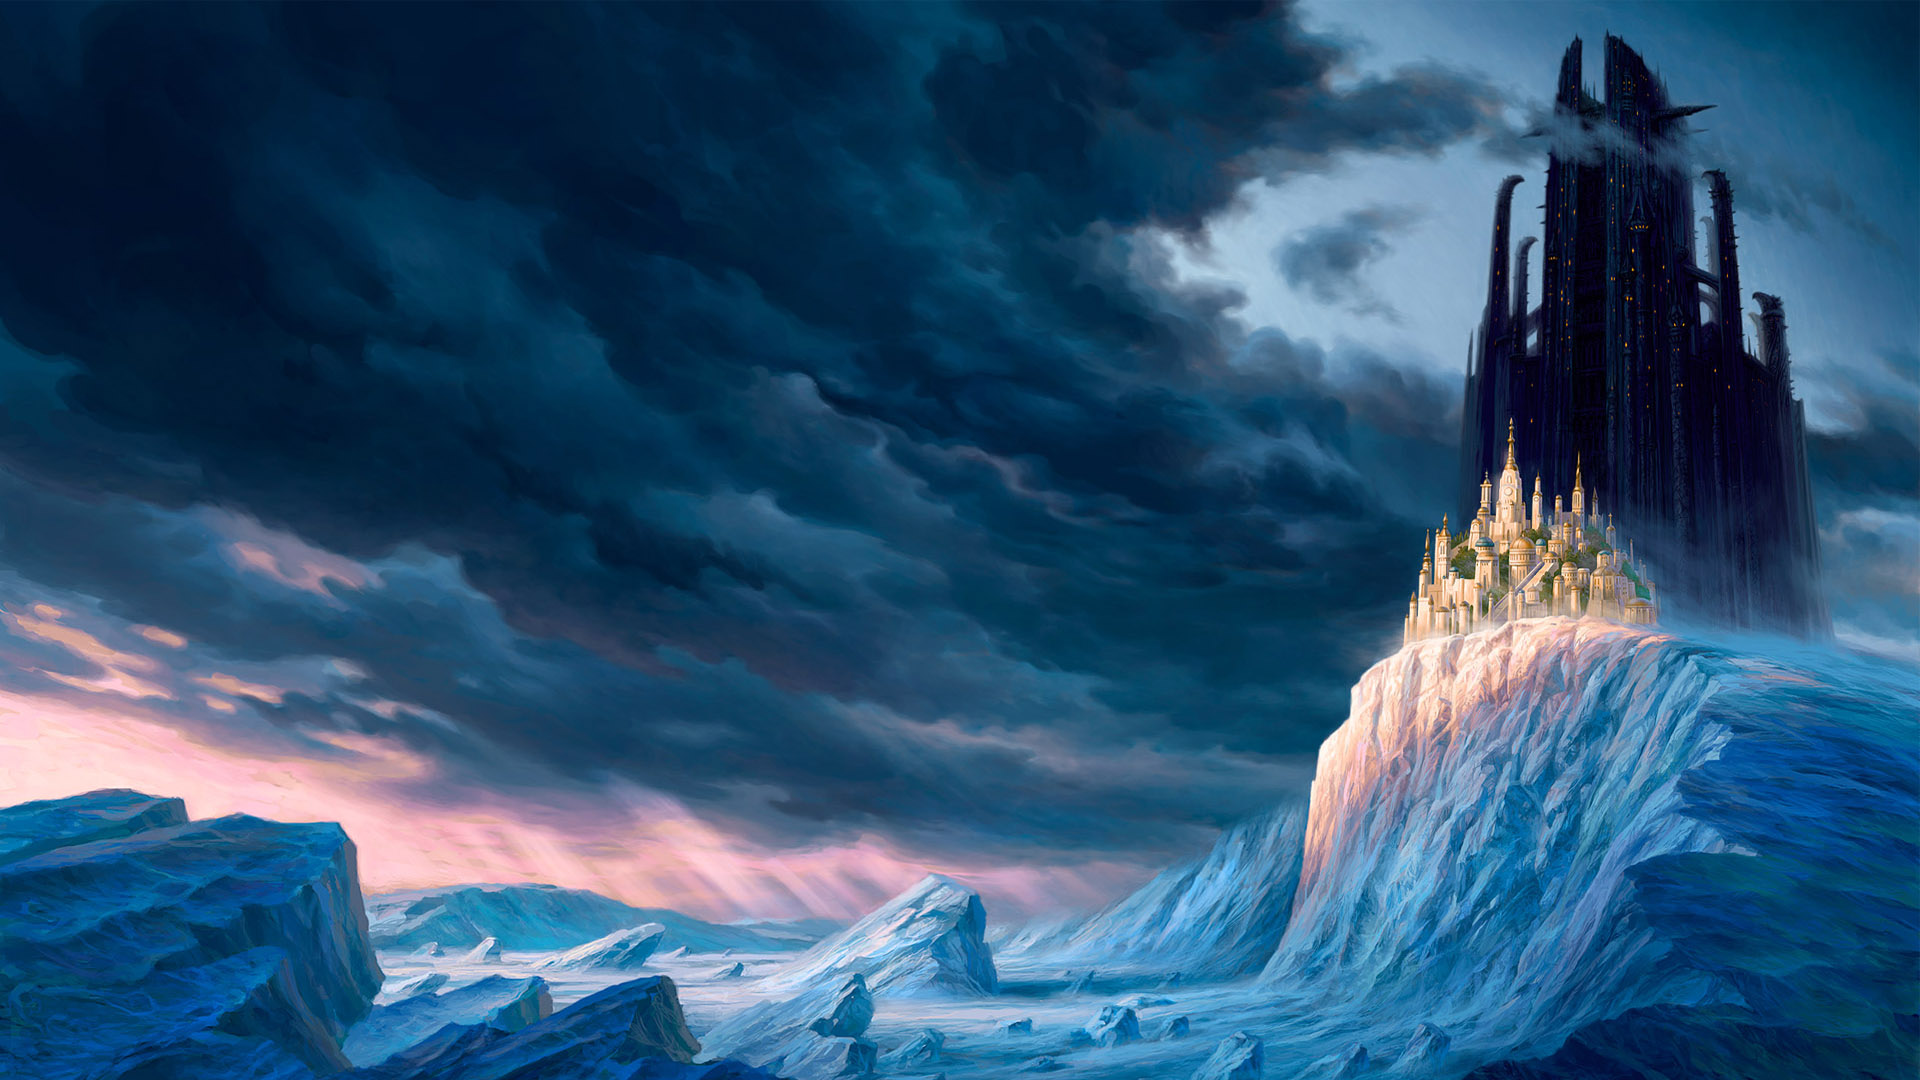 Free Download Full Hd Castle Desktop Backgrounds Wallpapers